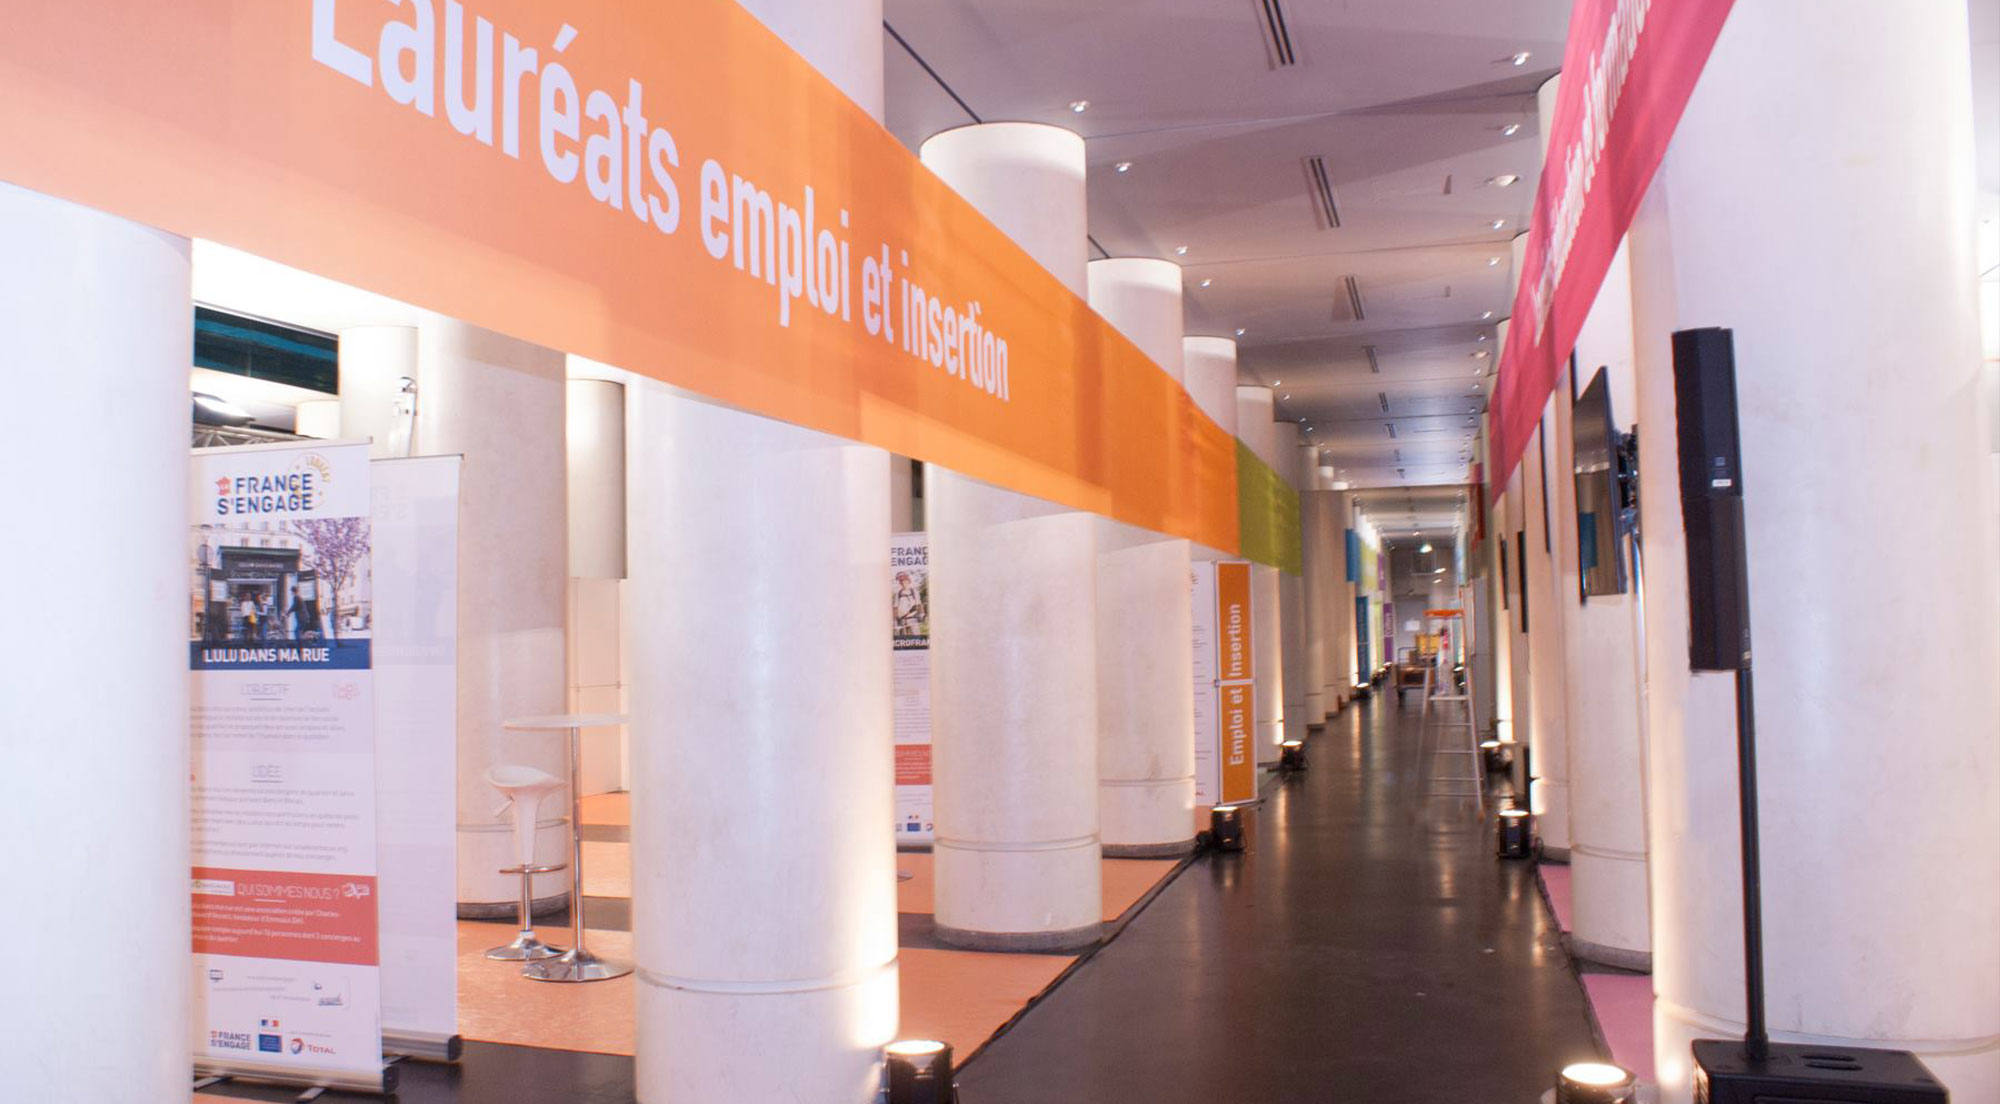 Installation generale organisation d evenements installations provisoires decors itinerants